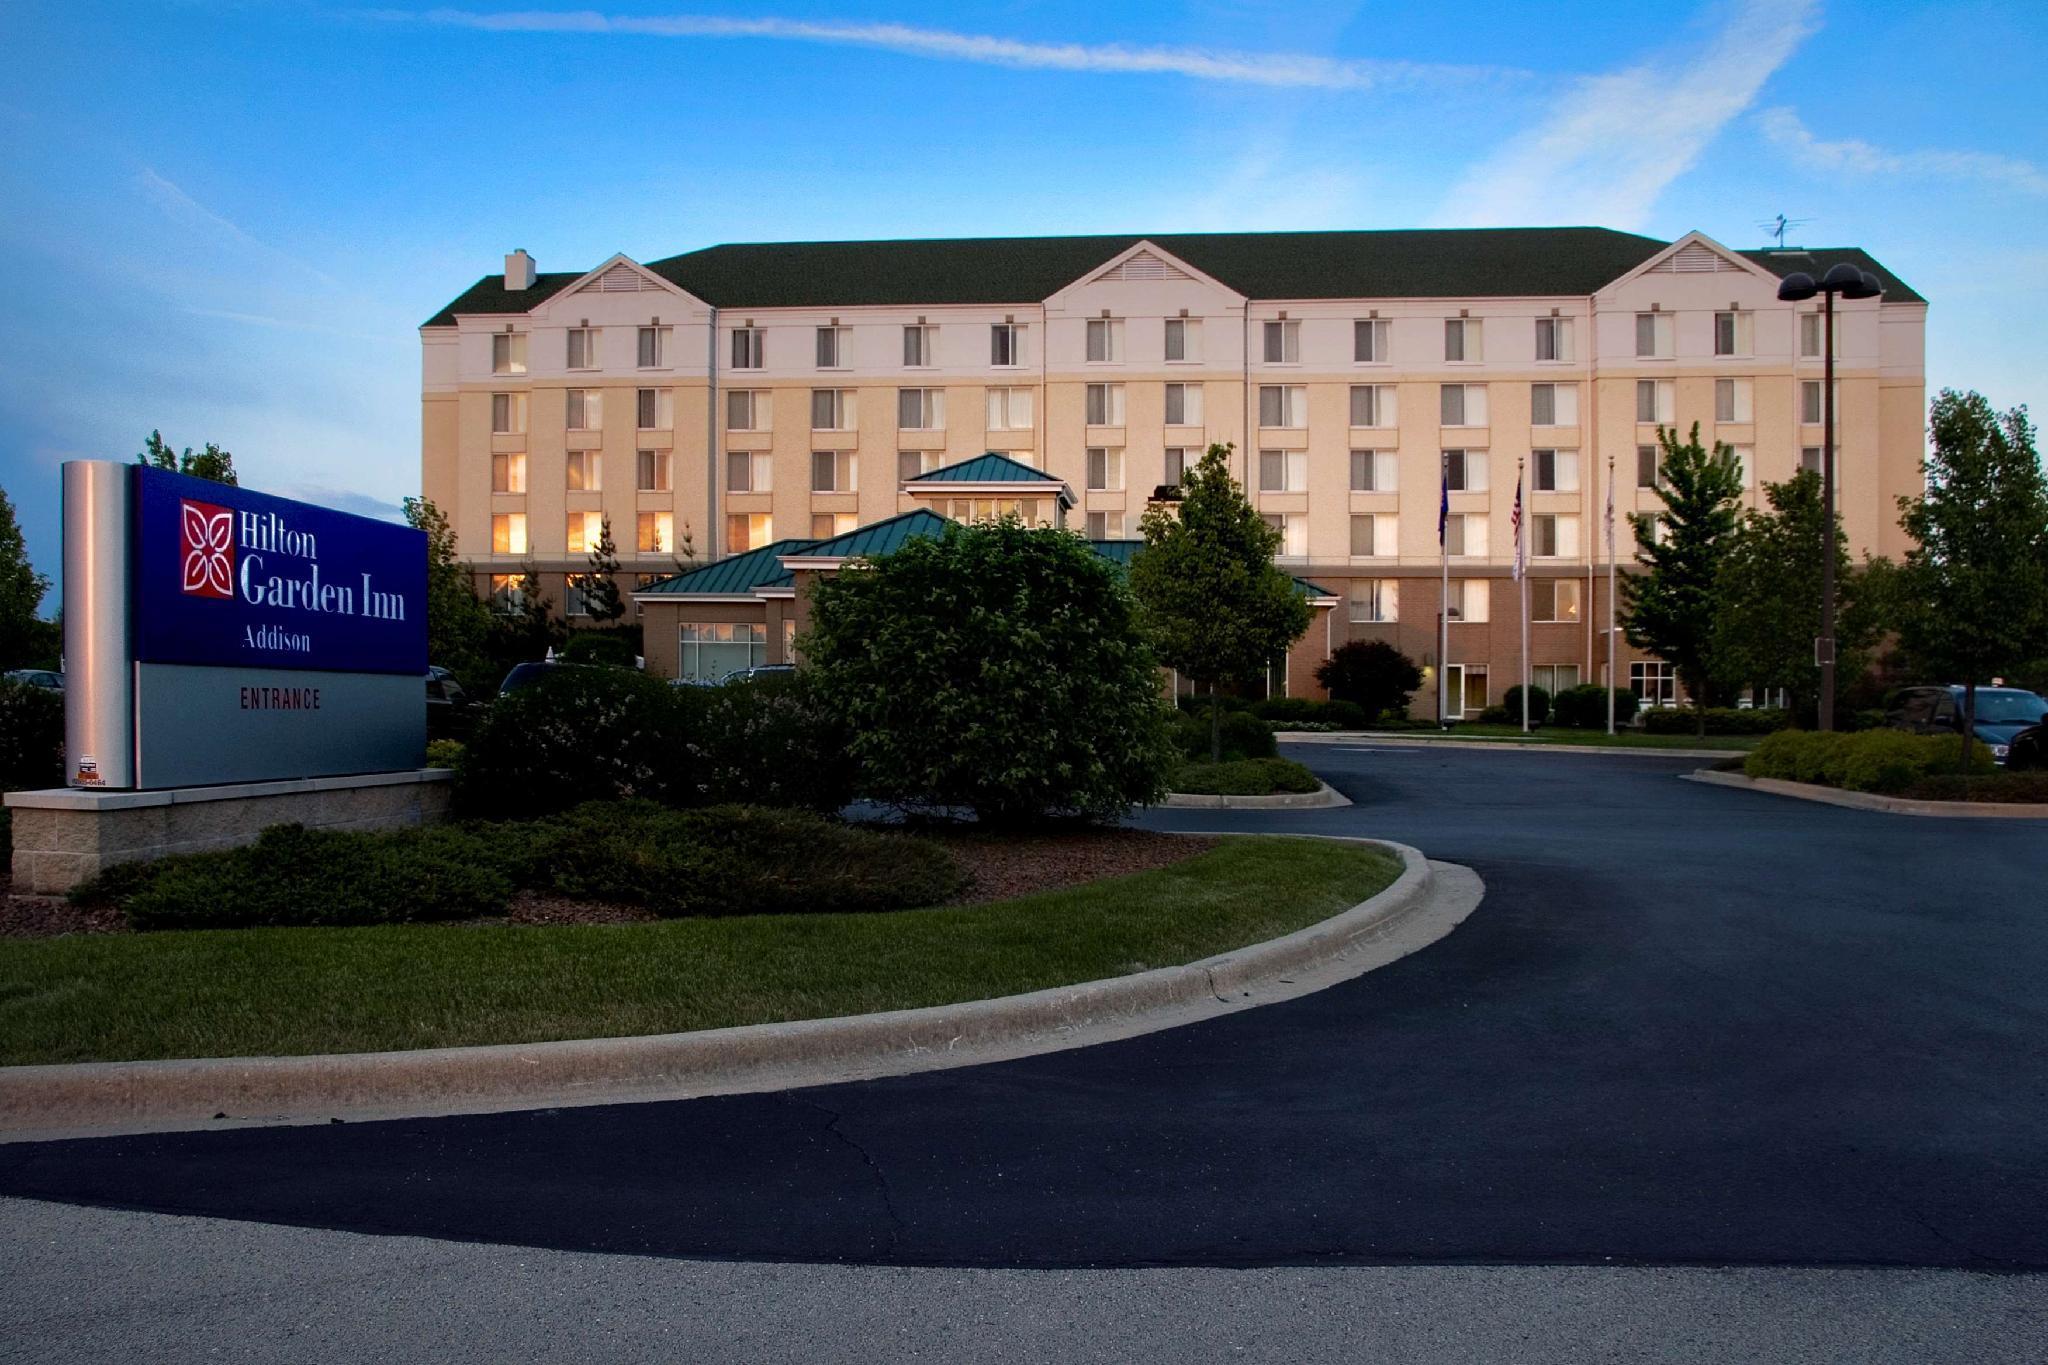 Hilton Garden Inn Addison Hotel image